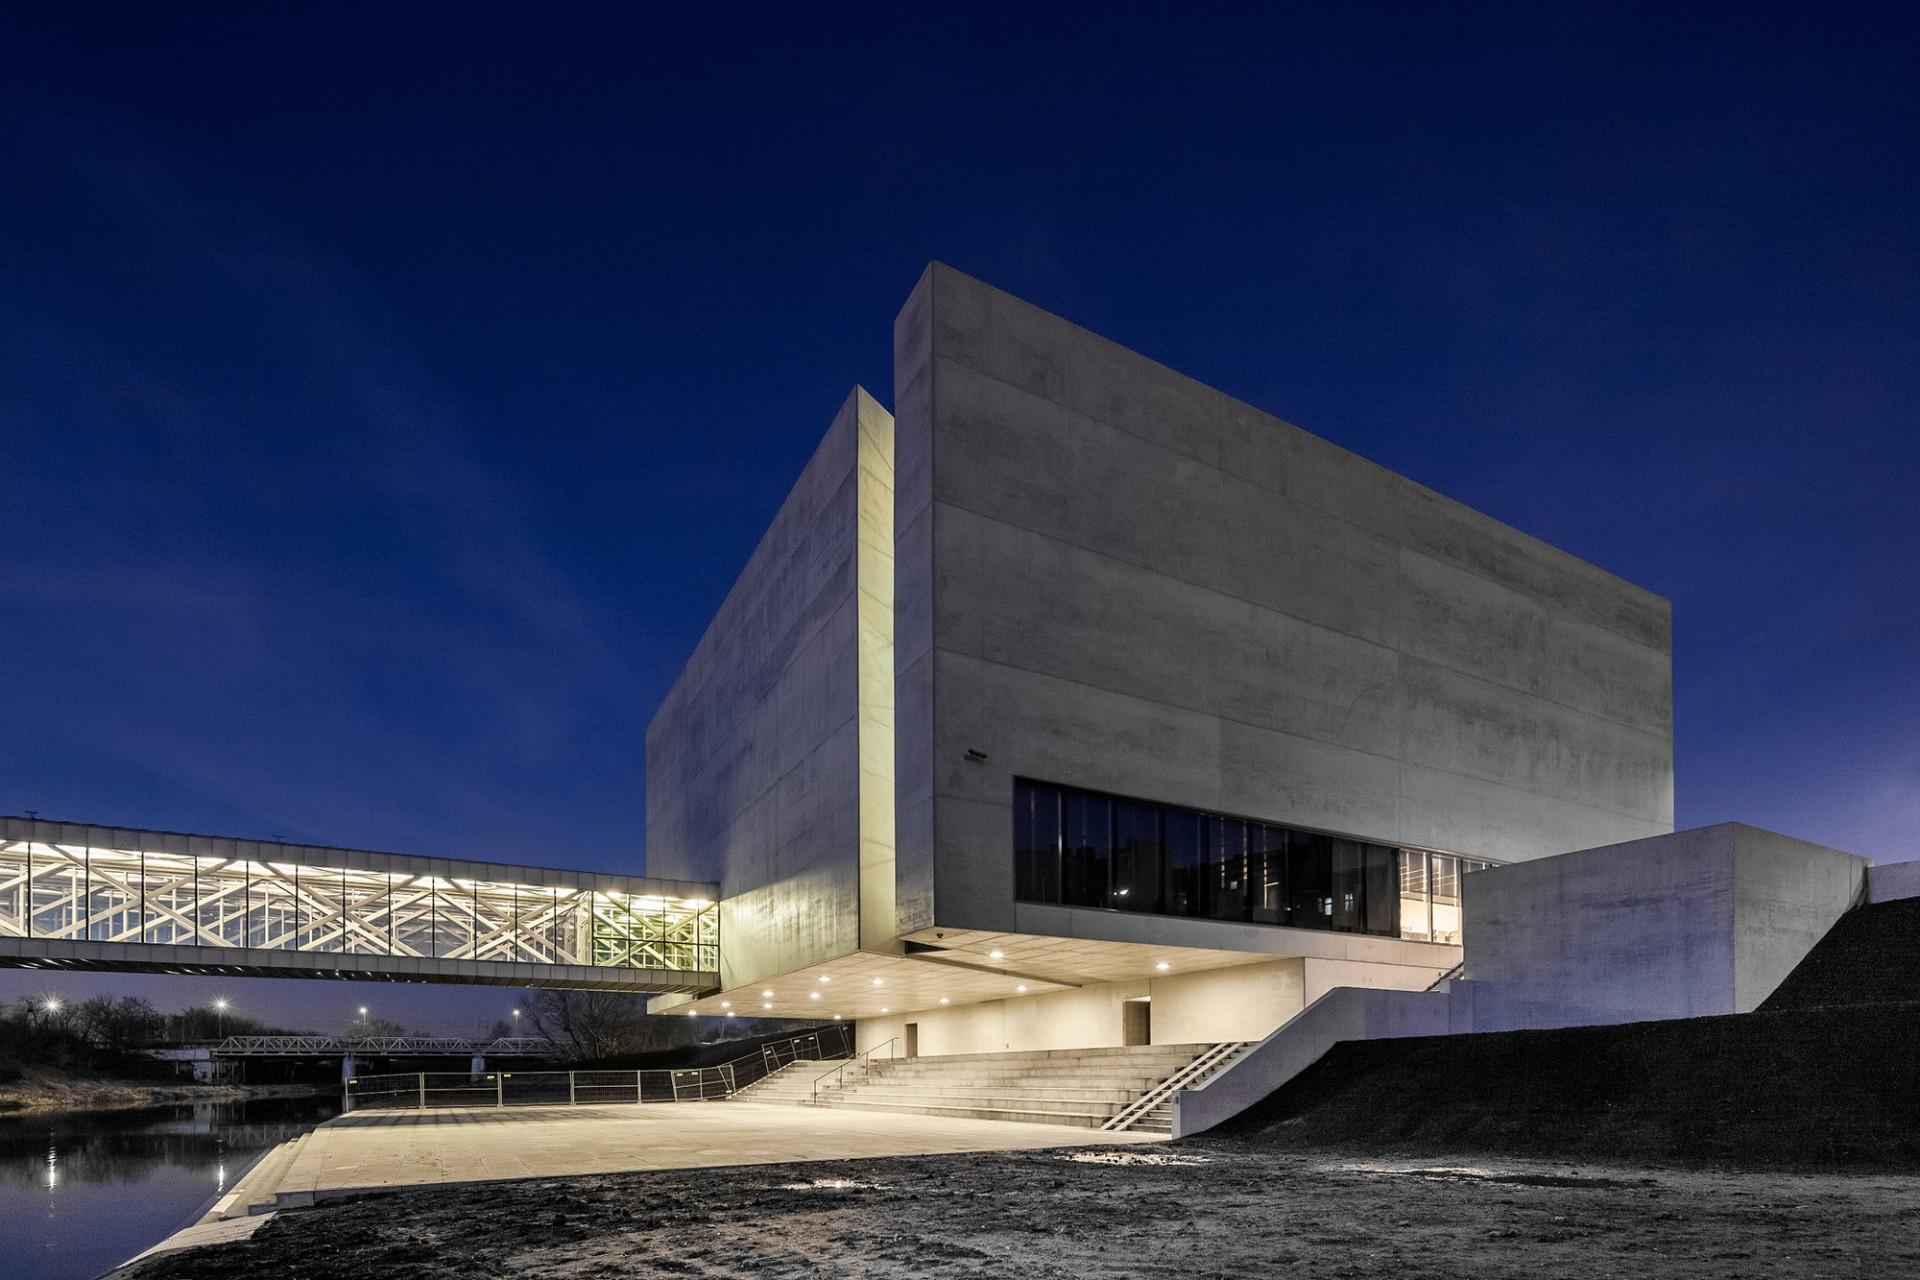 ICHOT: Interaktywne Centrum Historii Ostrowa Tumskiego